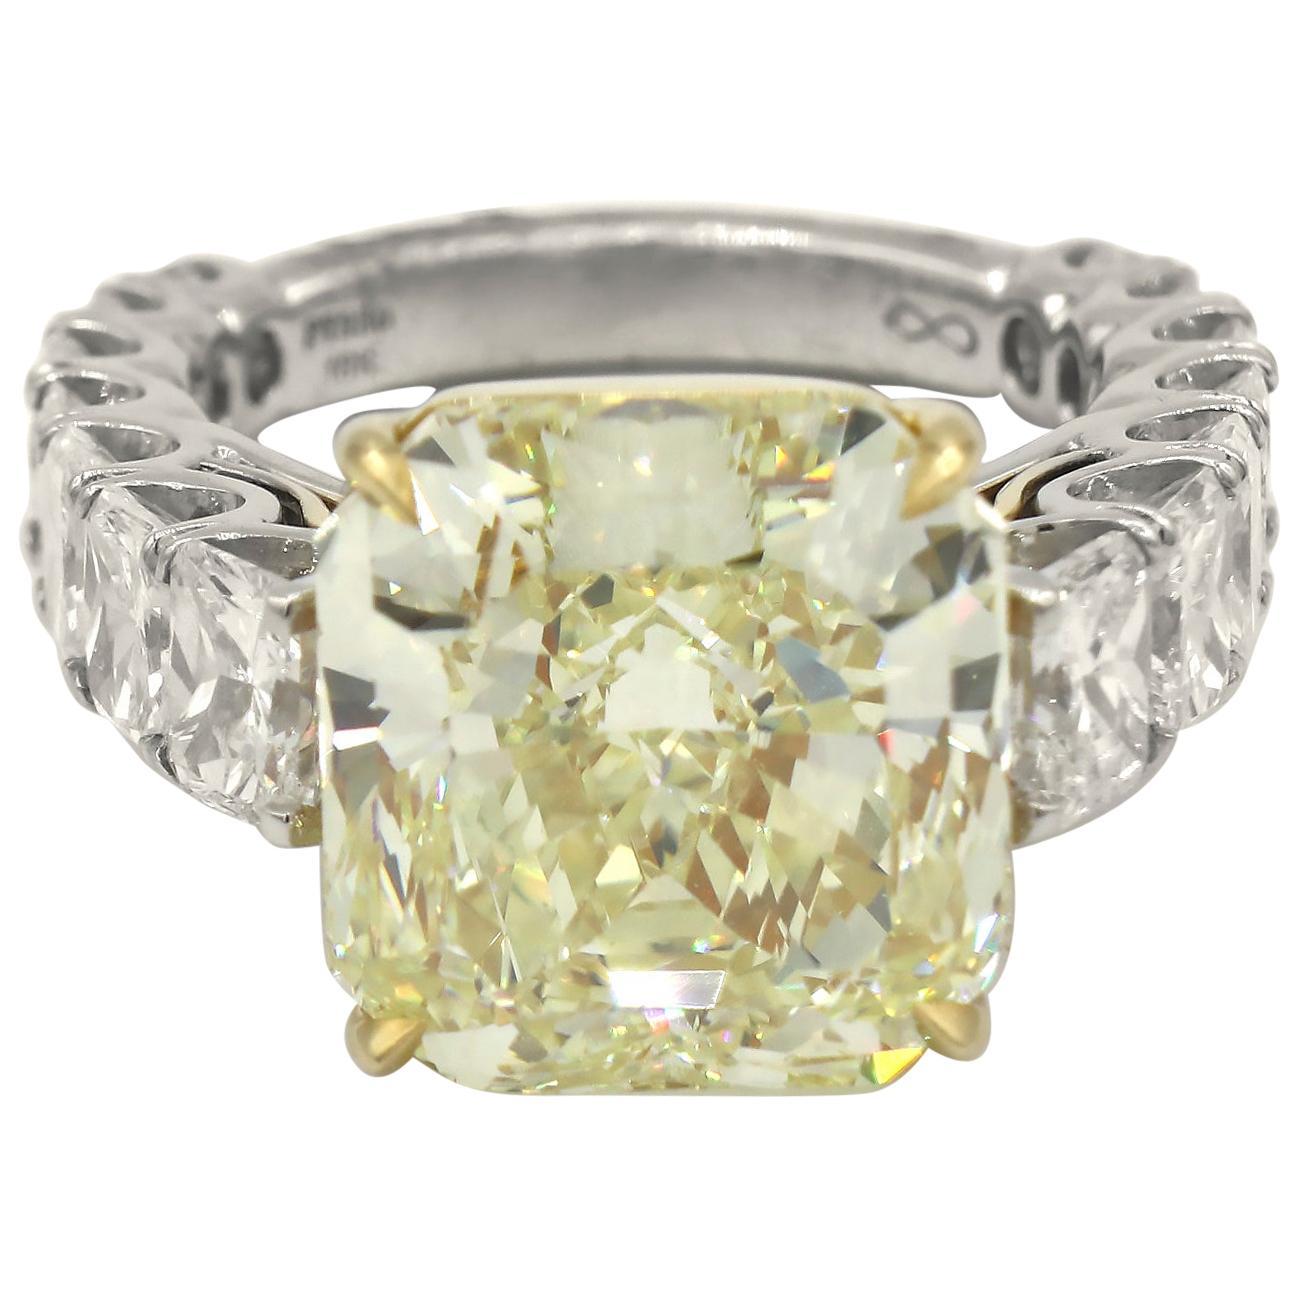 GIA Certified 12.50 Carat Fancy Yellow Radiant Diamond 17 Carat Diamond Ring PT